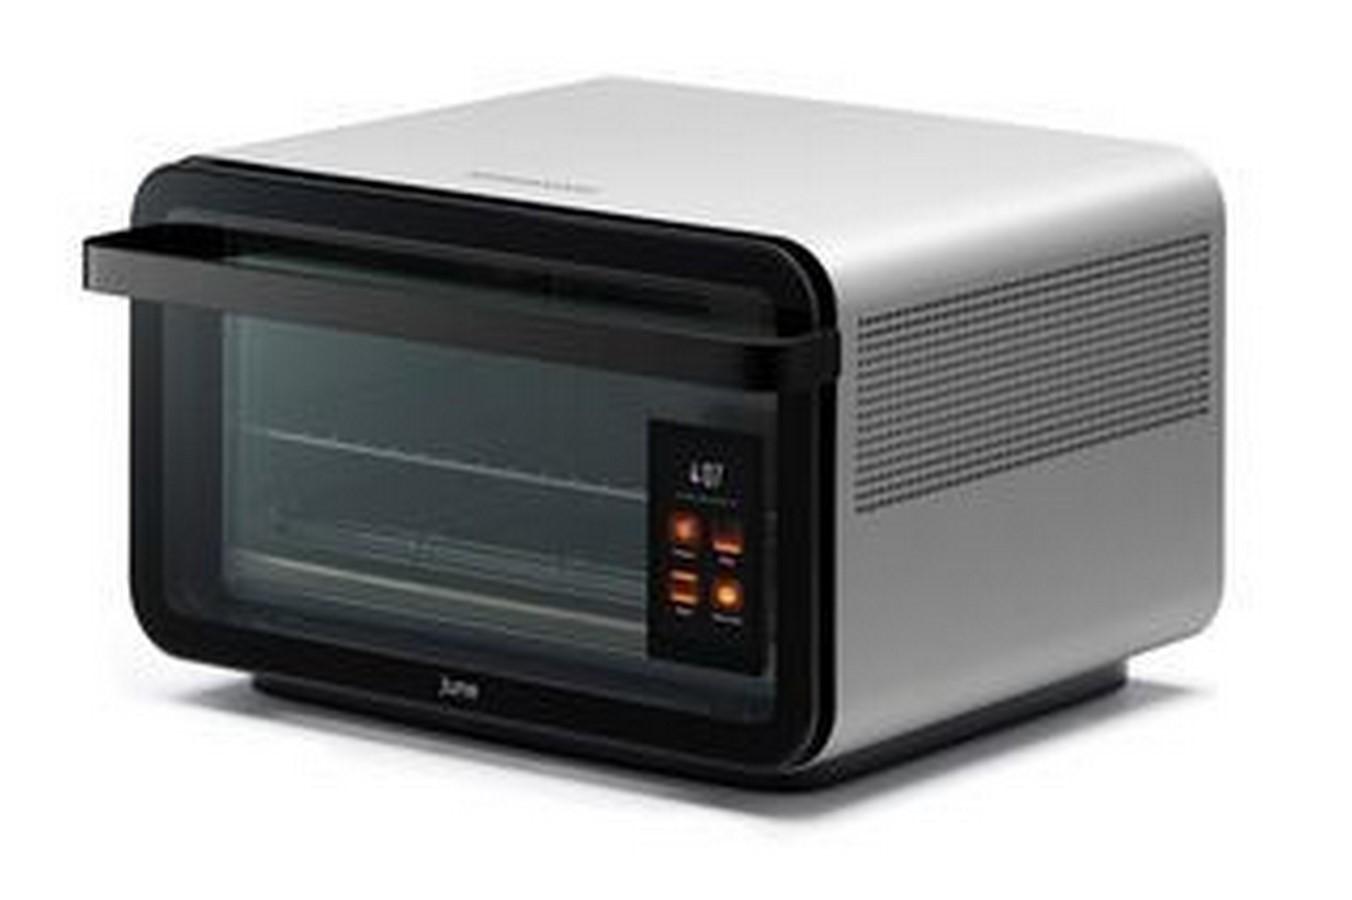 15 Smart gadgets for kitchen - Sheet7